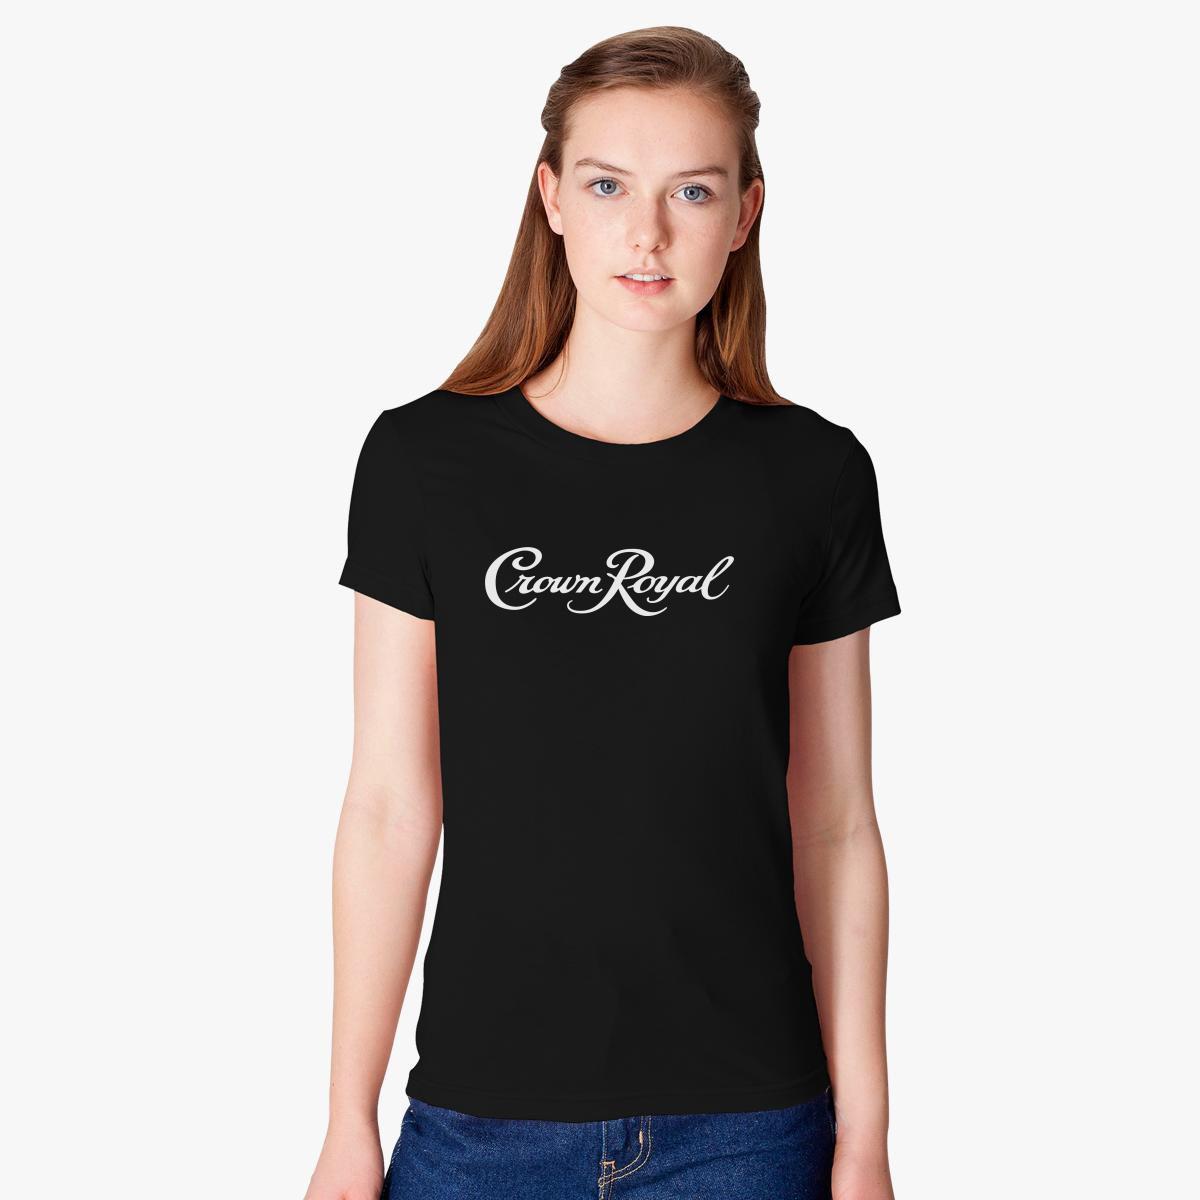 2e35d45cfc Crown Royal Women's T-shirt - Customon